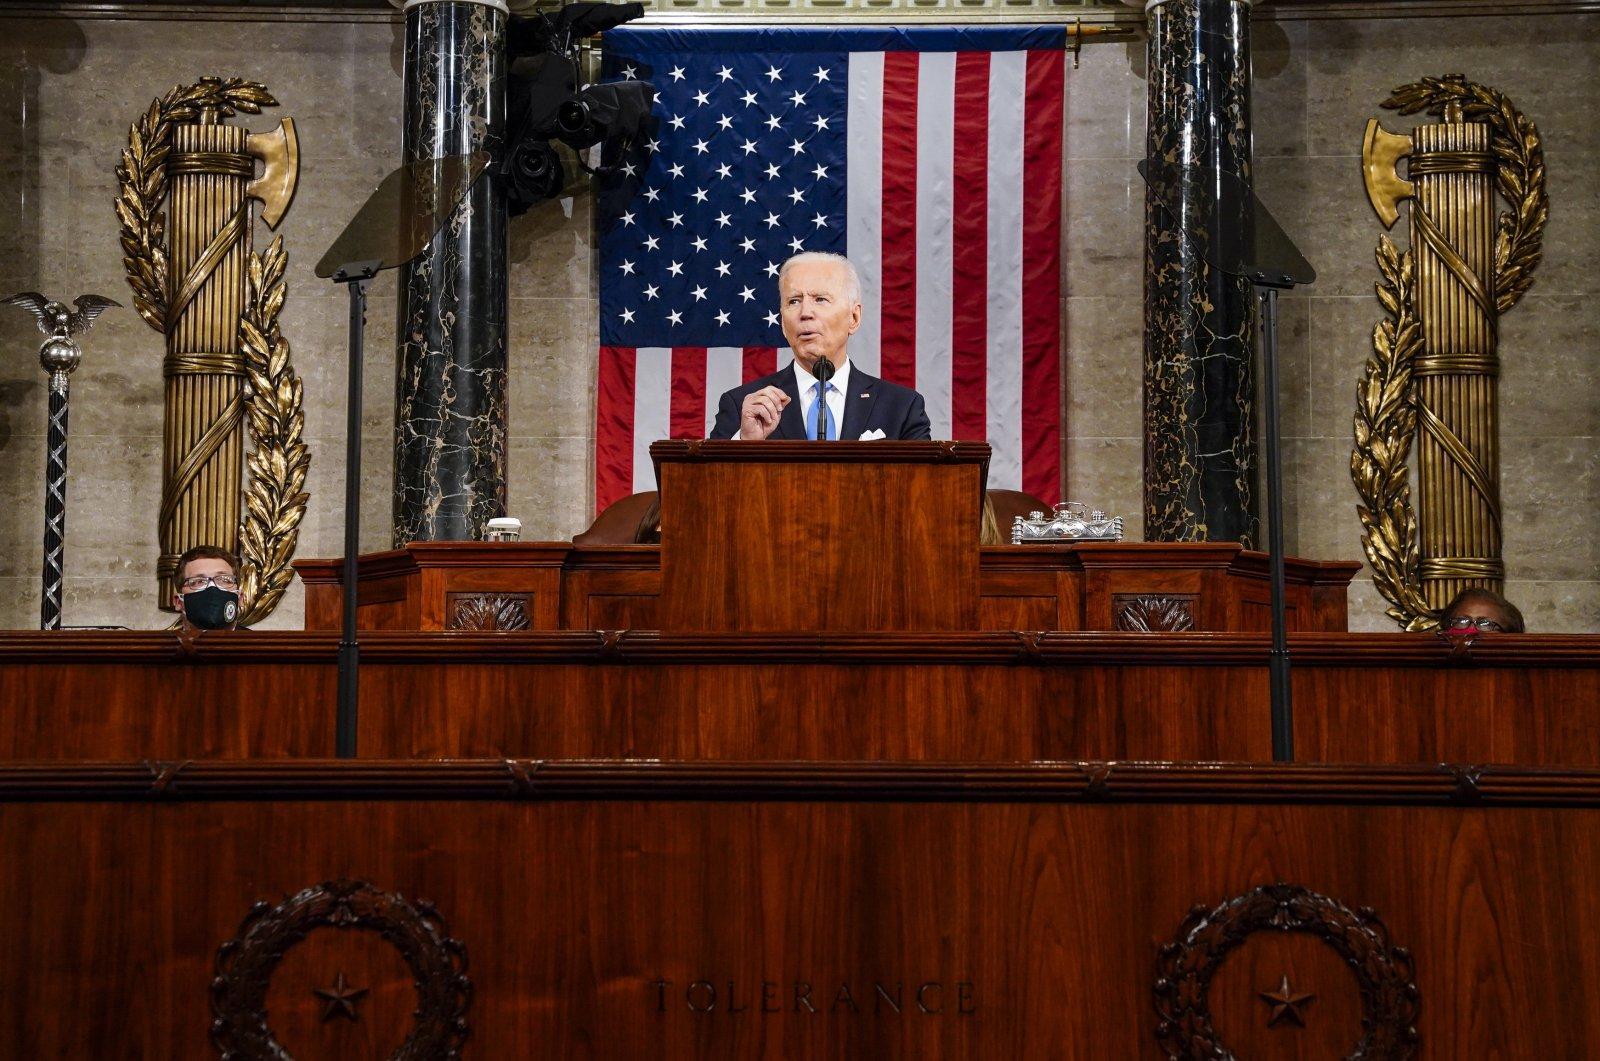 U.S. President Joe Biden addresses a joint session of Congress, with Vice President Kamala Harris and House Speaker Nancy Pelosi behind him, at the Capitol in Washington, D.C., U.S., April 28, 2021. (EPA Photo)